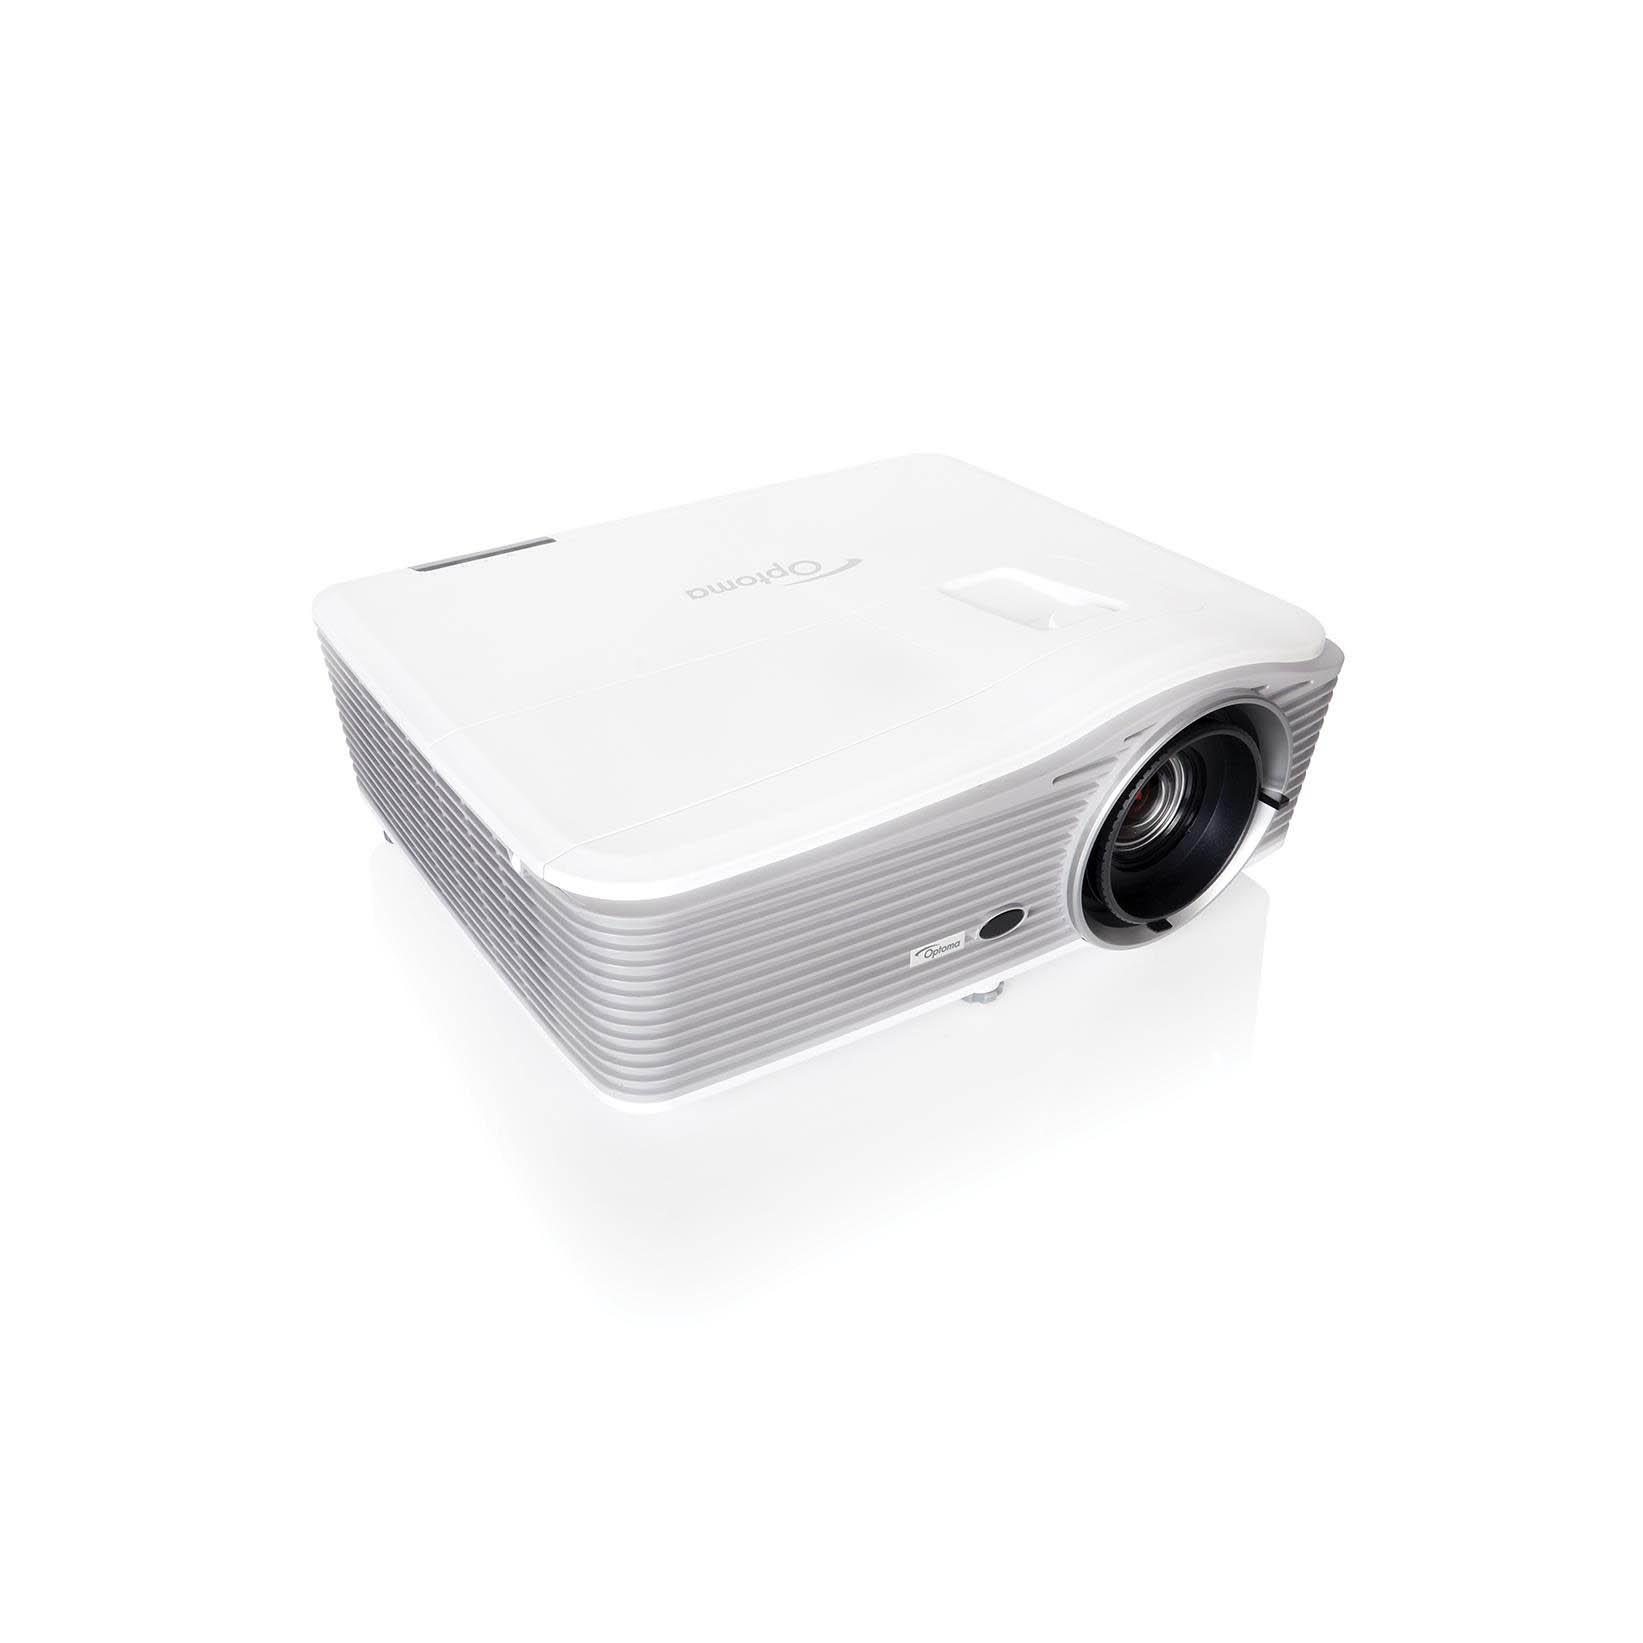 WU515 2?bw=75&w=75&bh=75&h=75 optoma wu515 wuxga [16 10] projector with 6,000 lumens optoma Projector Wiring Setup at bayanpartner.co